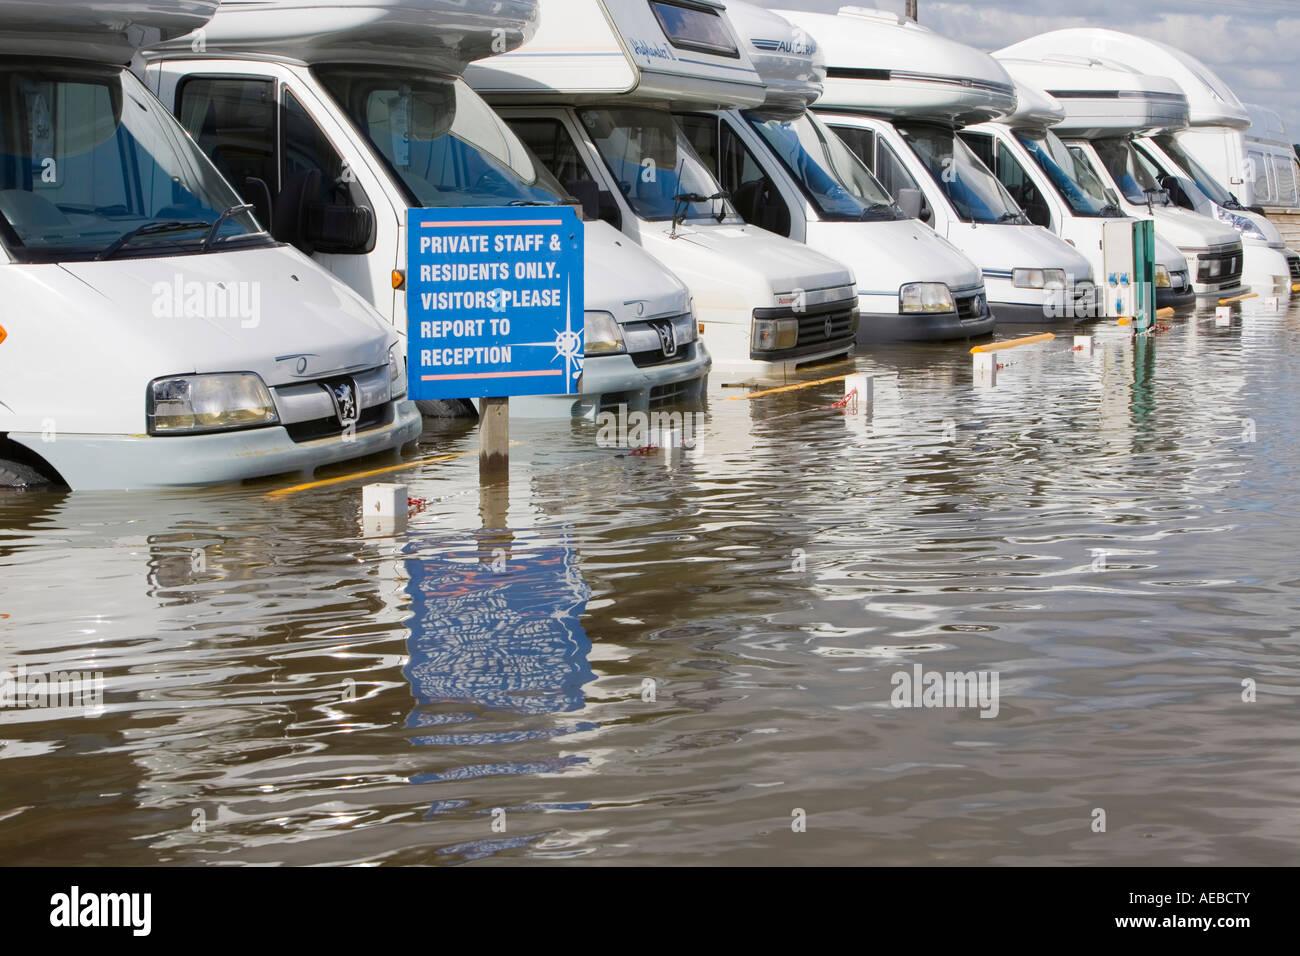 The Tewkesbury floods - Stock Image